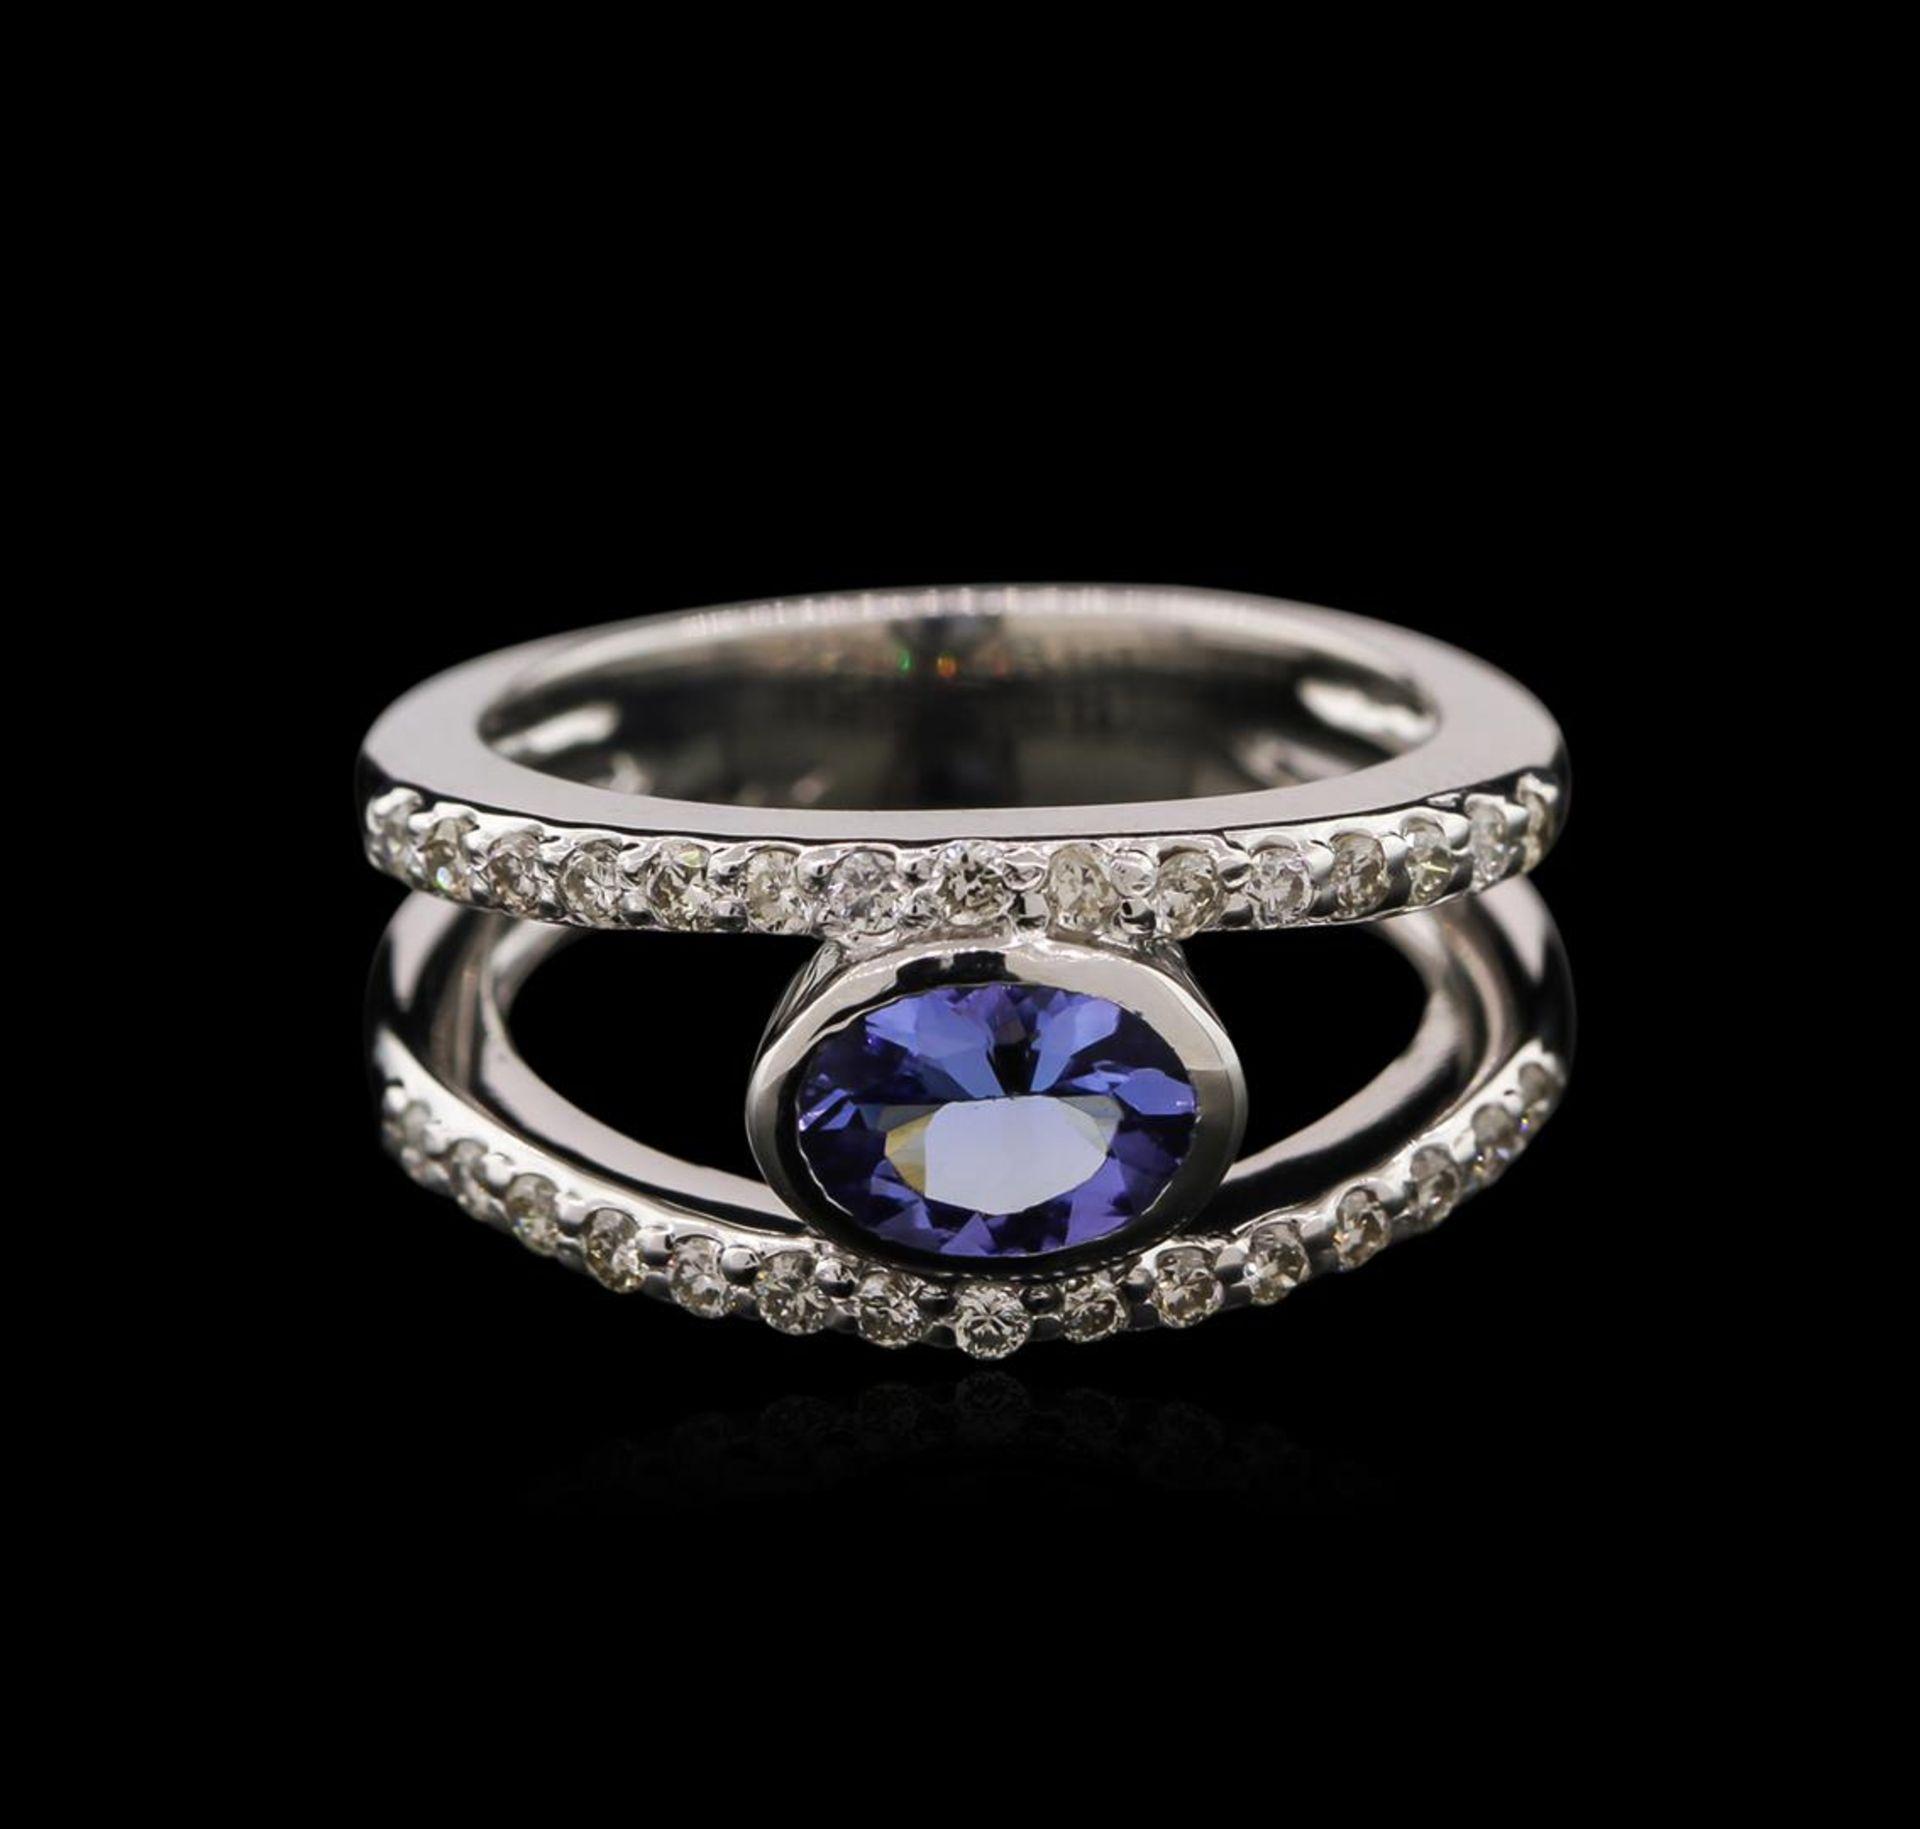 0.74 ctw Tanzanite and Diamond Ring - 14KT White Gold - Image 2 of 2